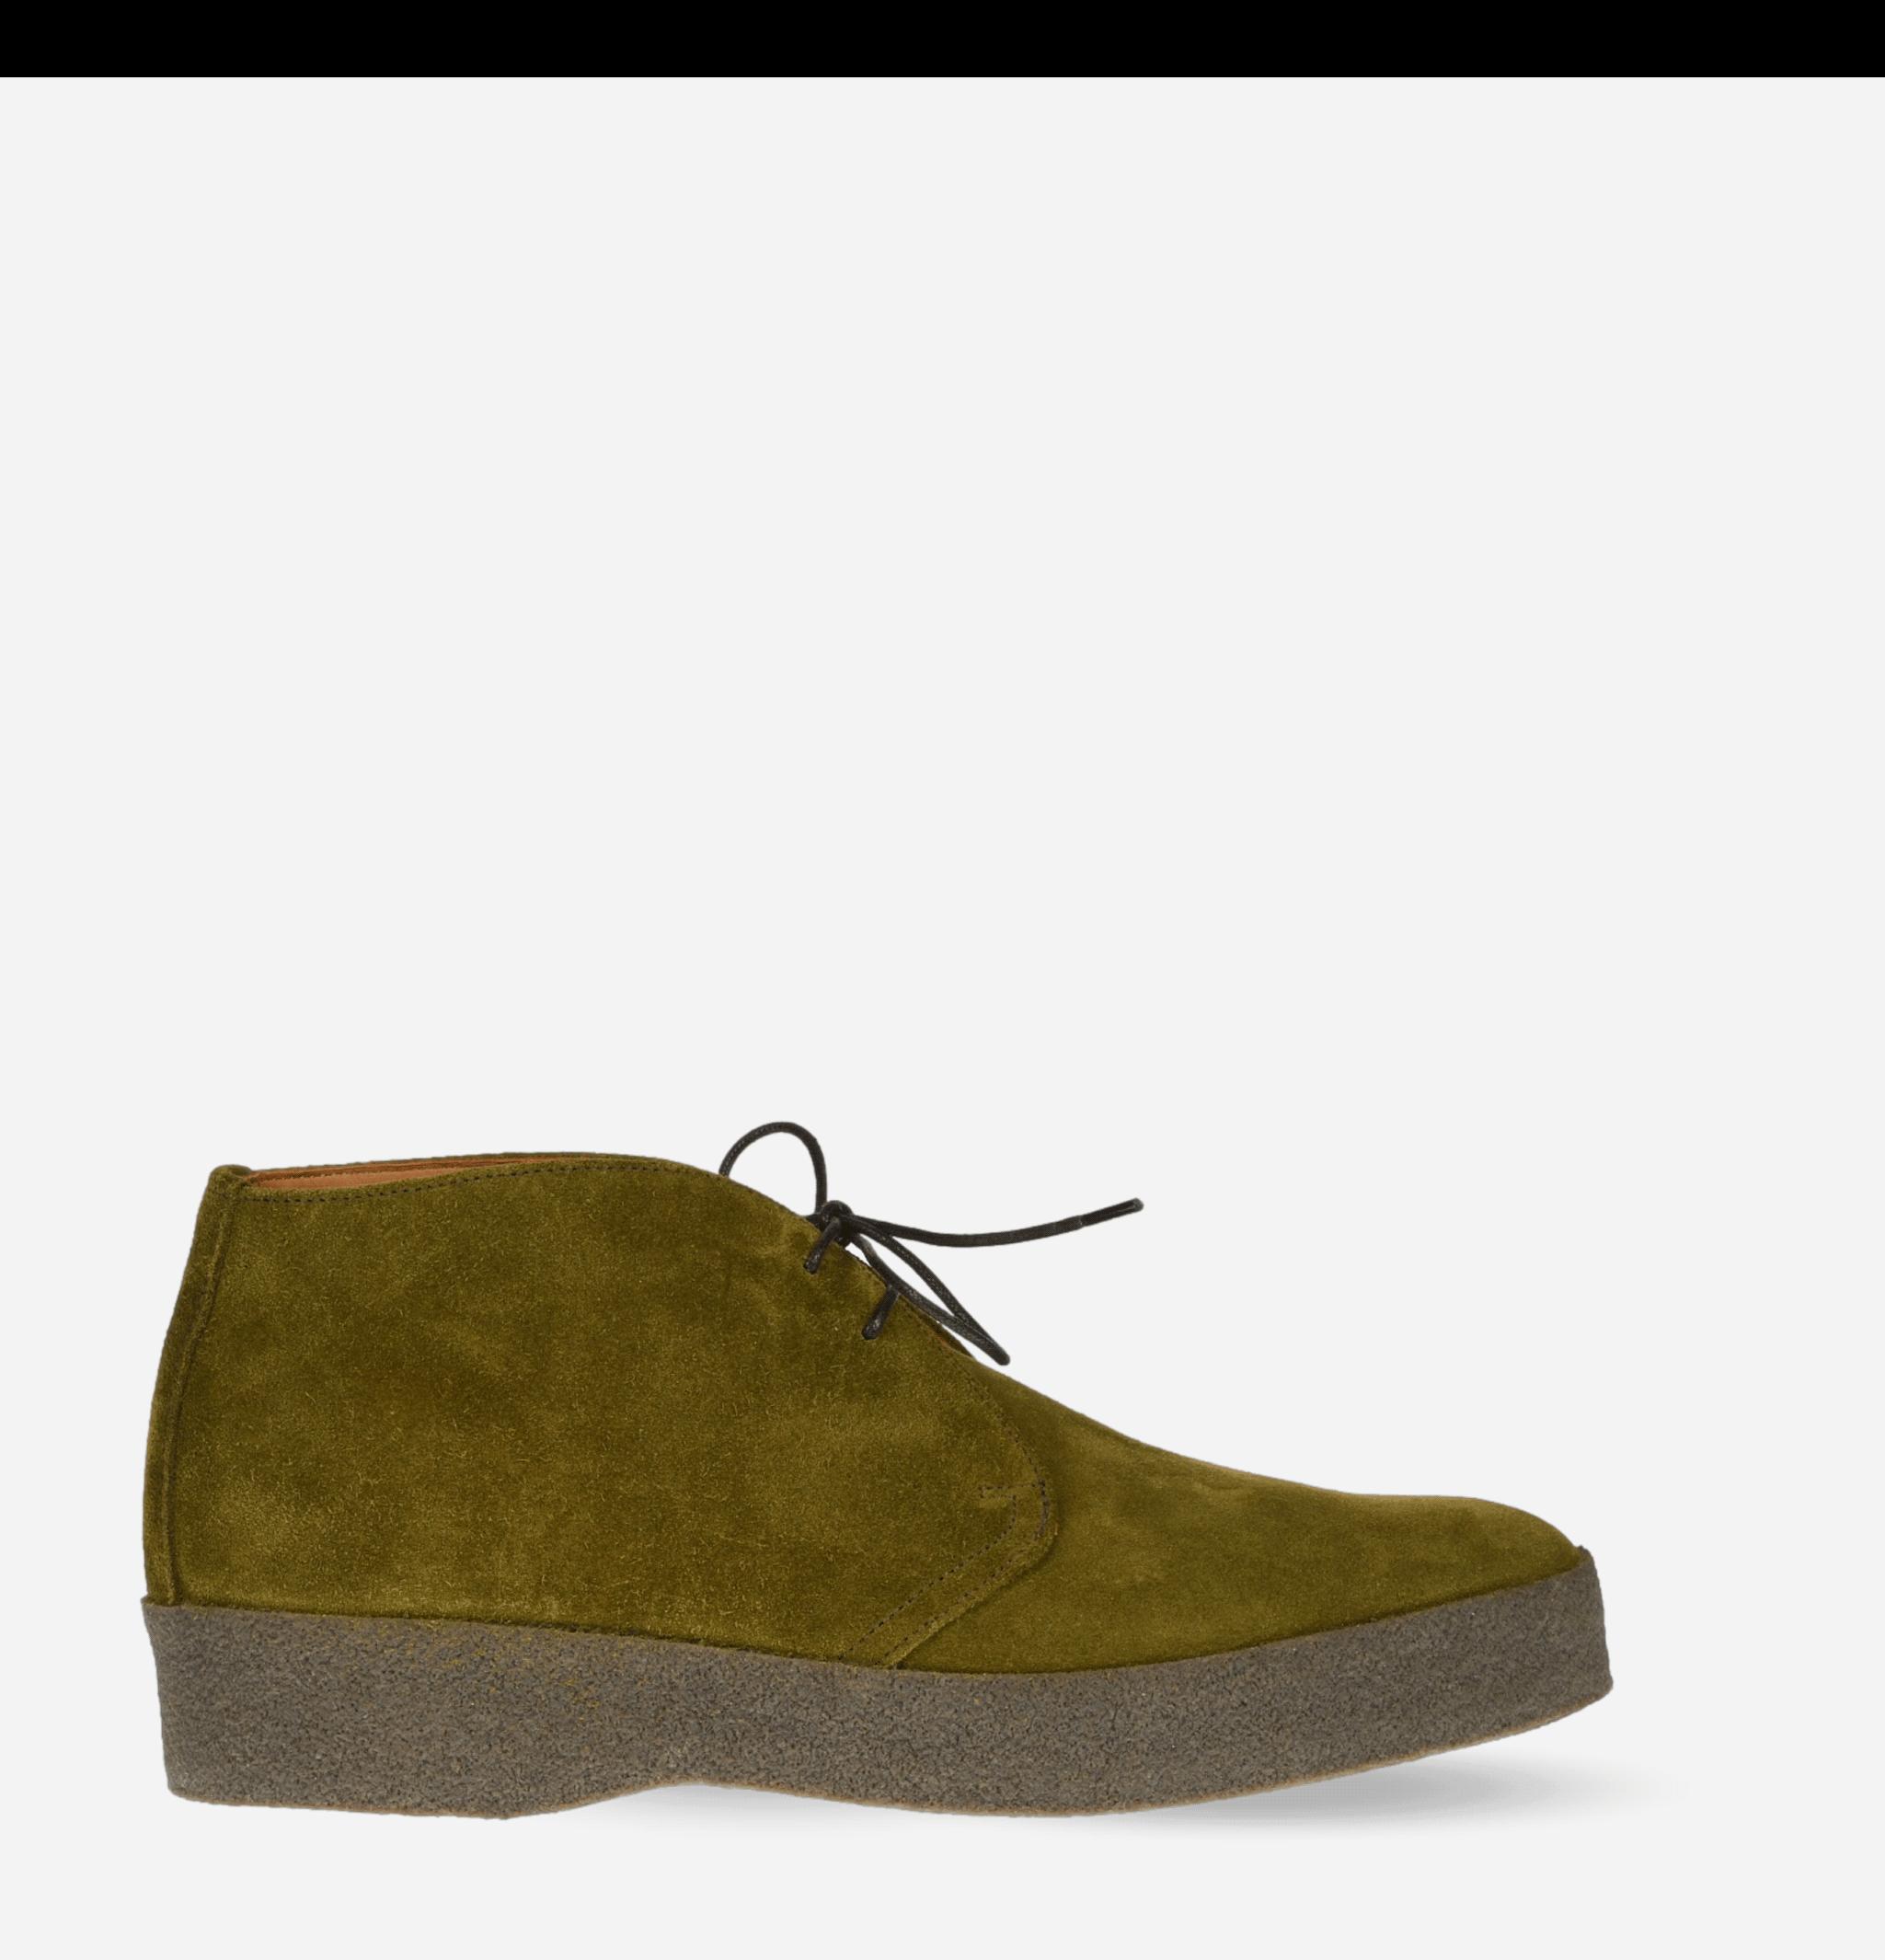 Chaussures Sanders Hi-top Vert